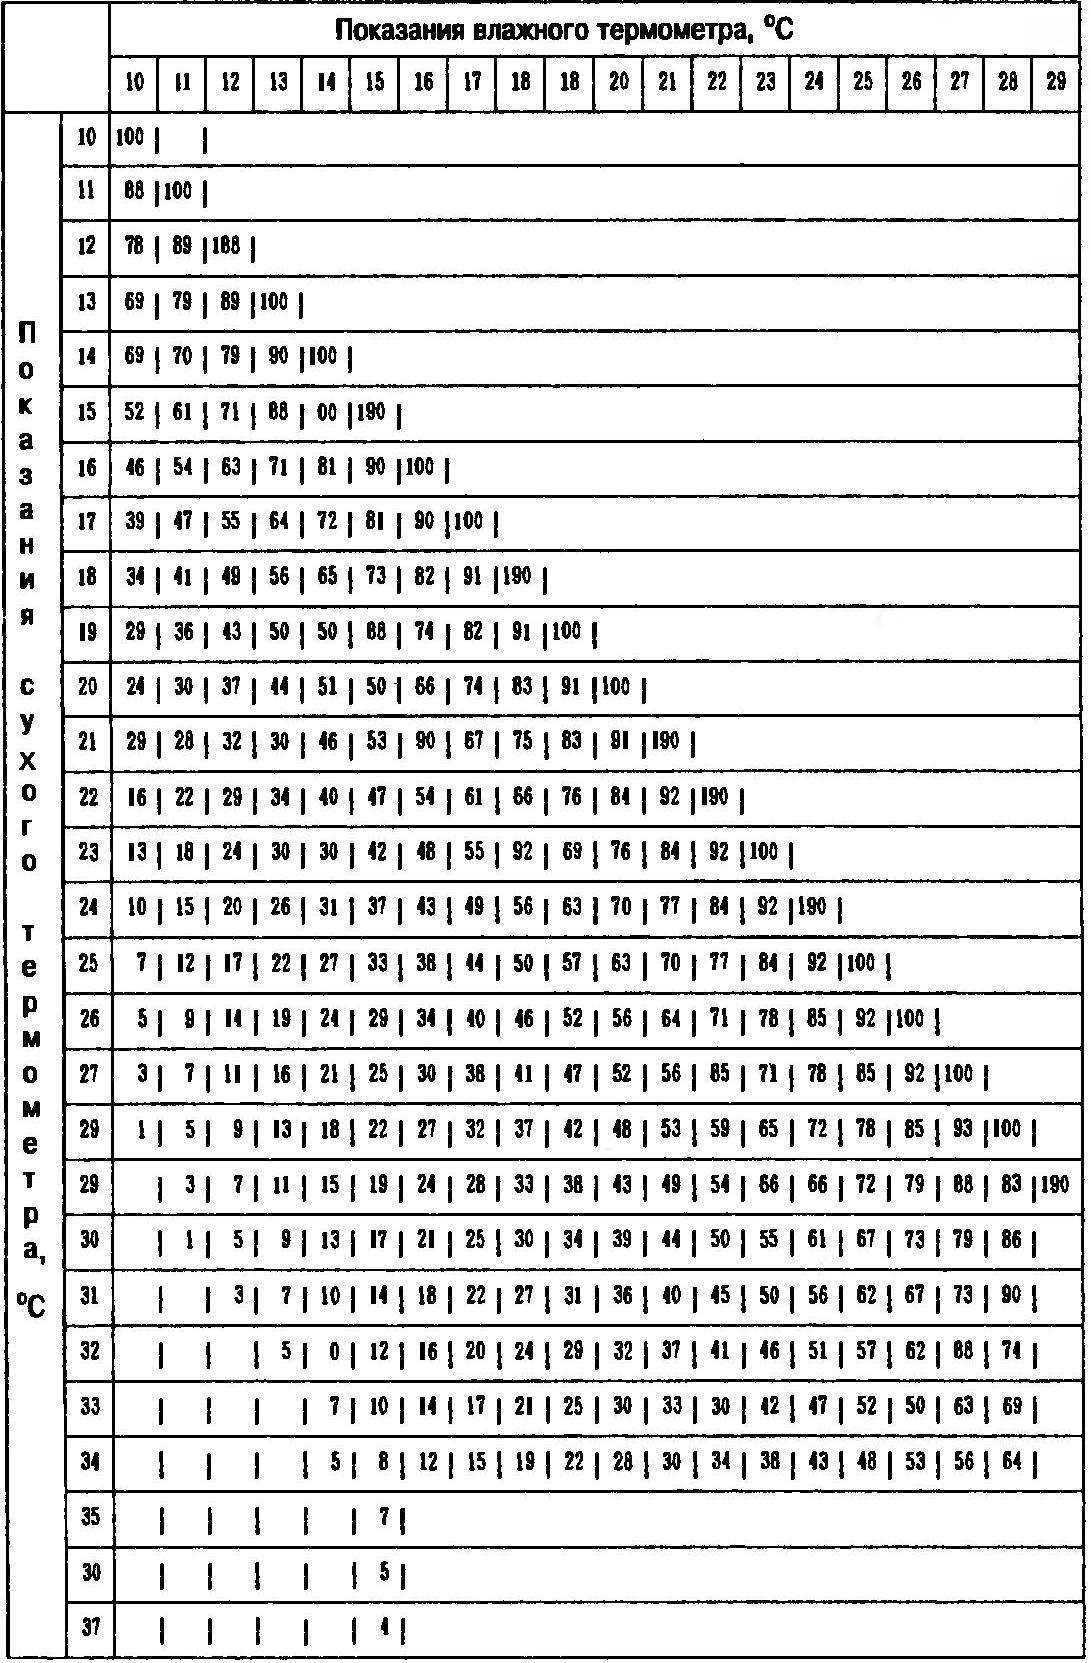 Psychrometric table